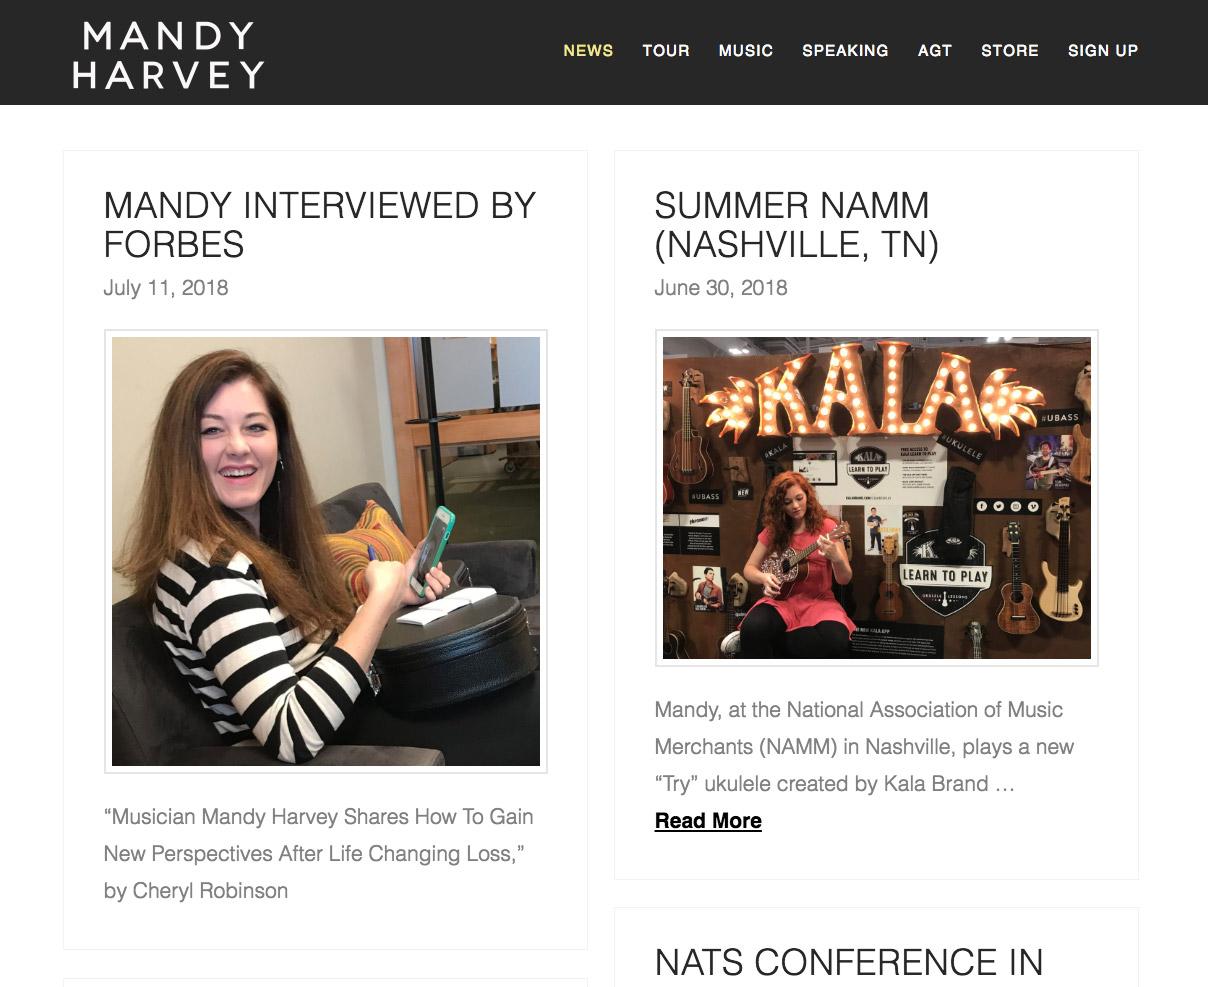 mandy harvey website screenshot of news